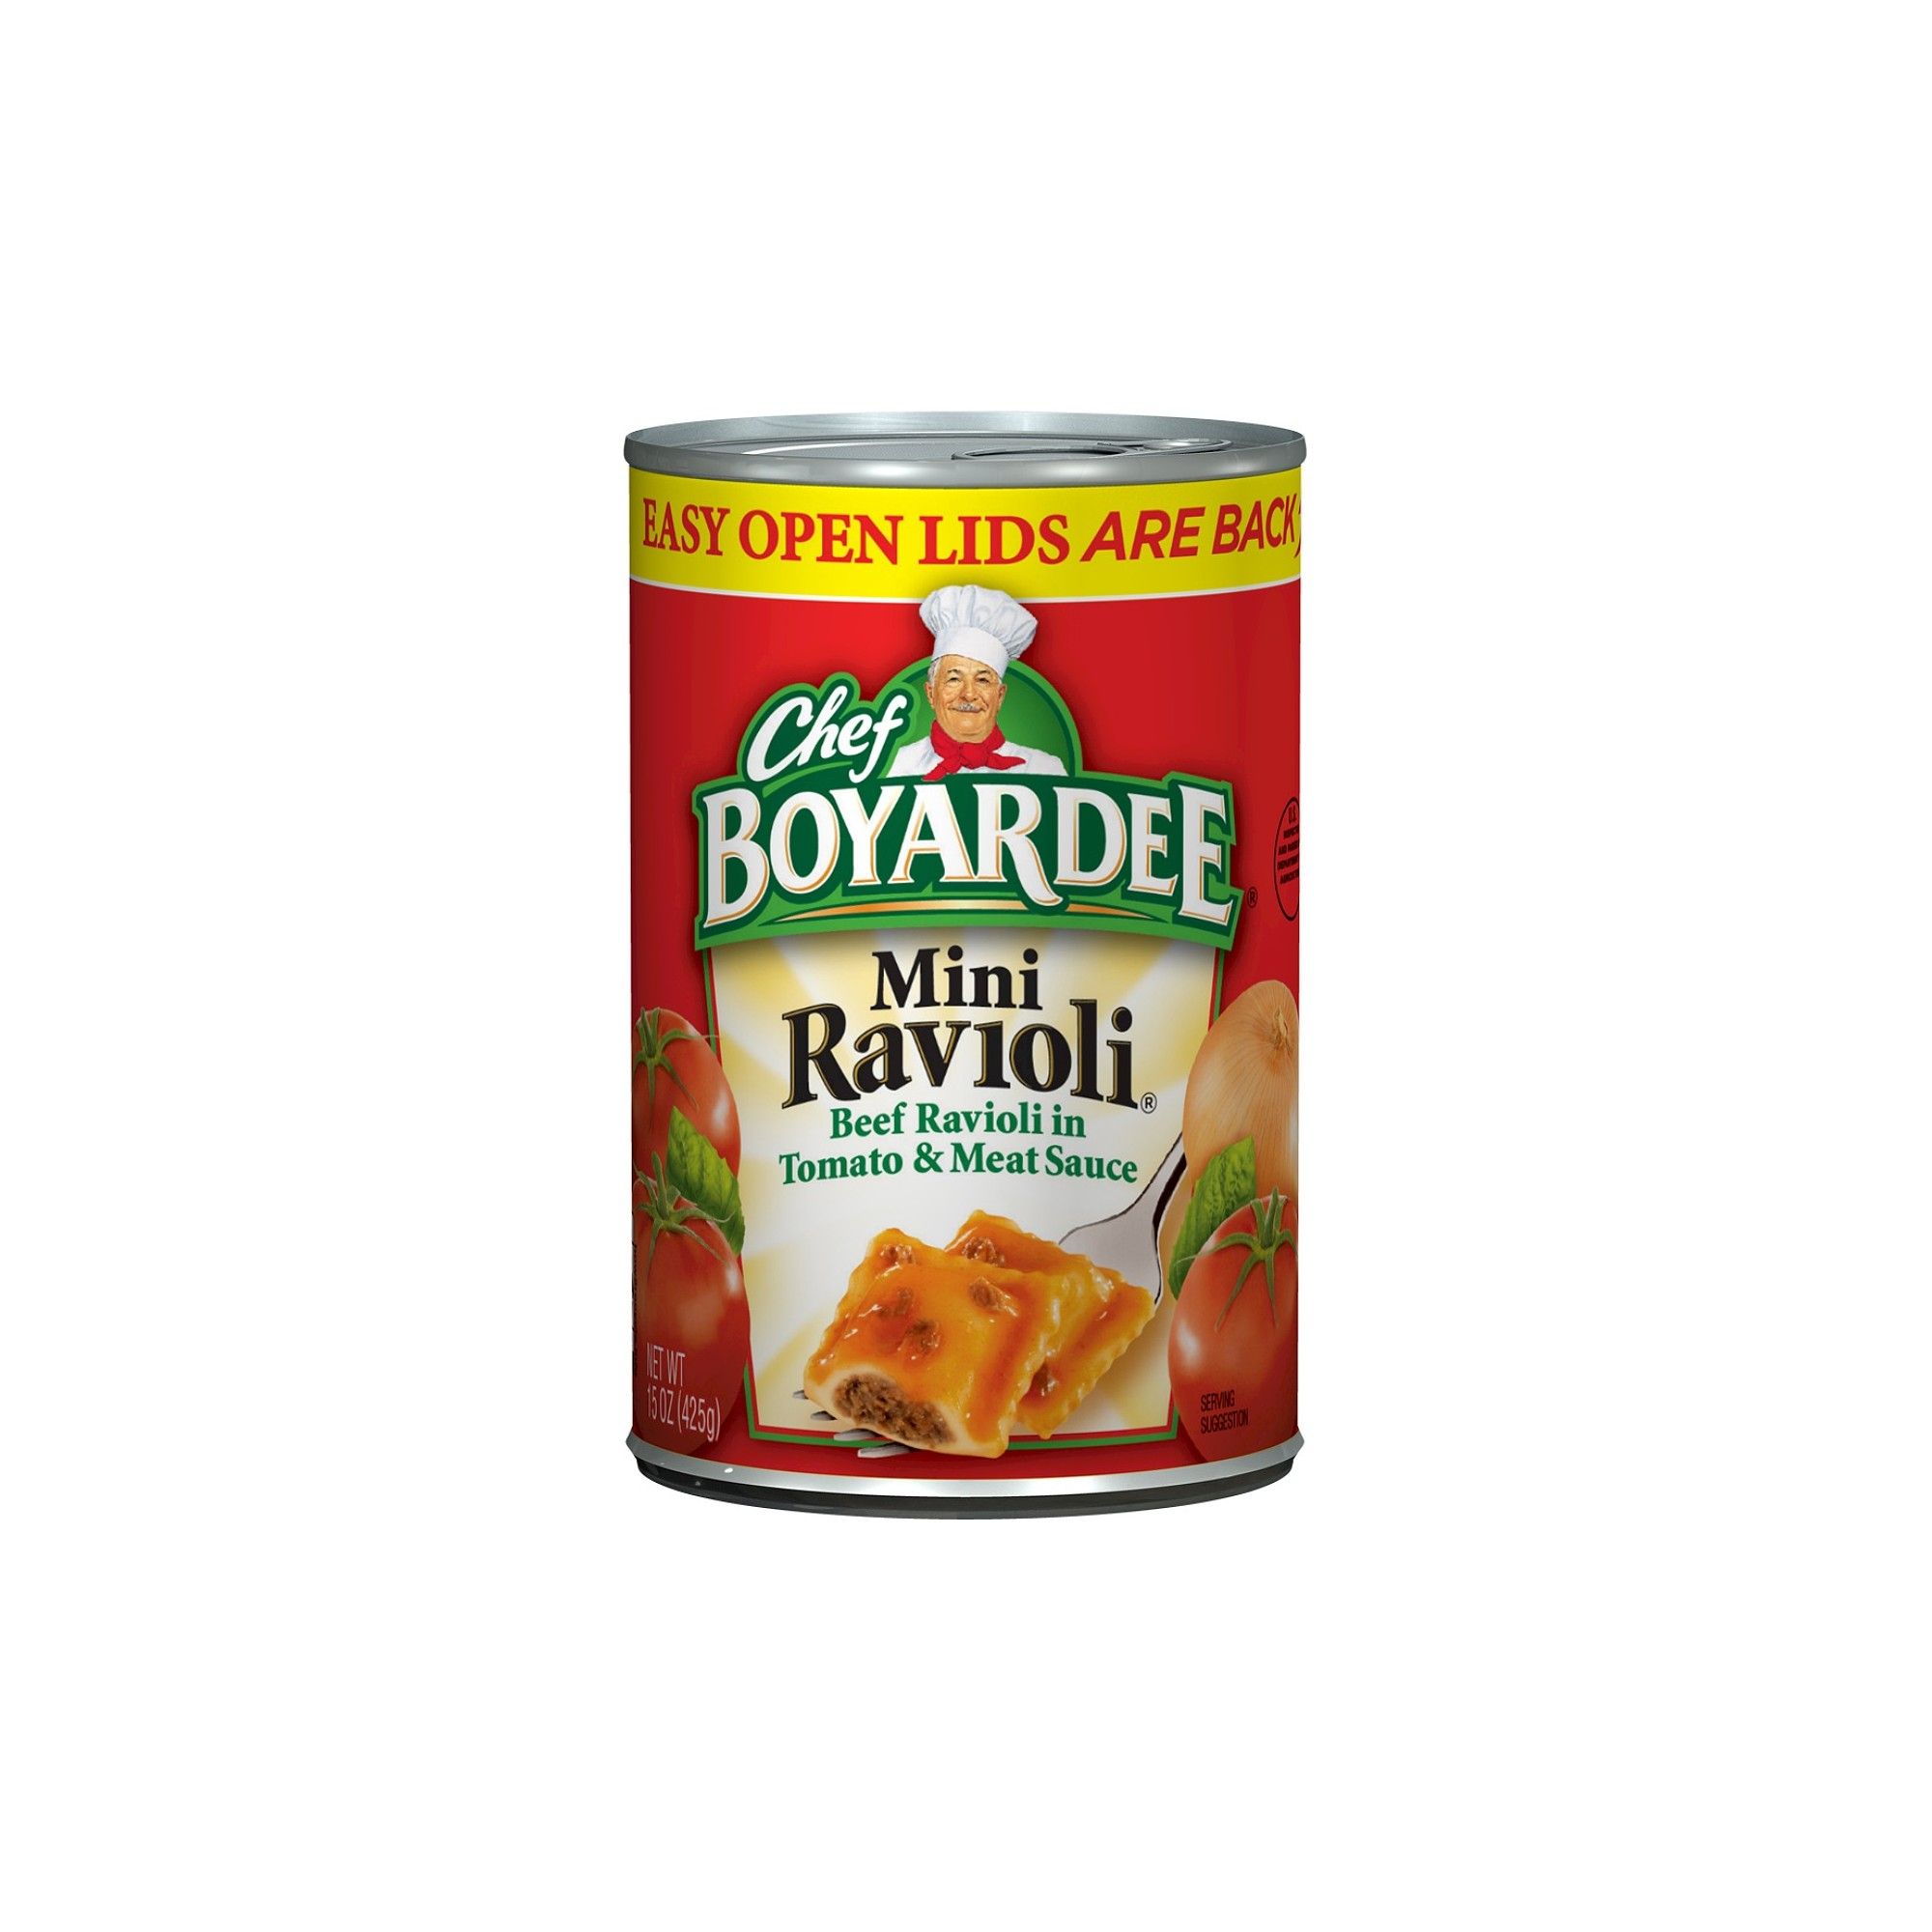 Chef Boyardee Mini Ravioli 15 Oz